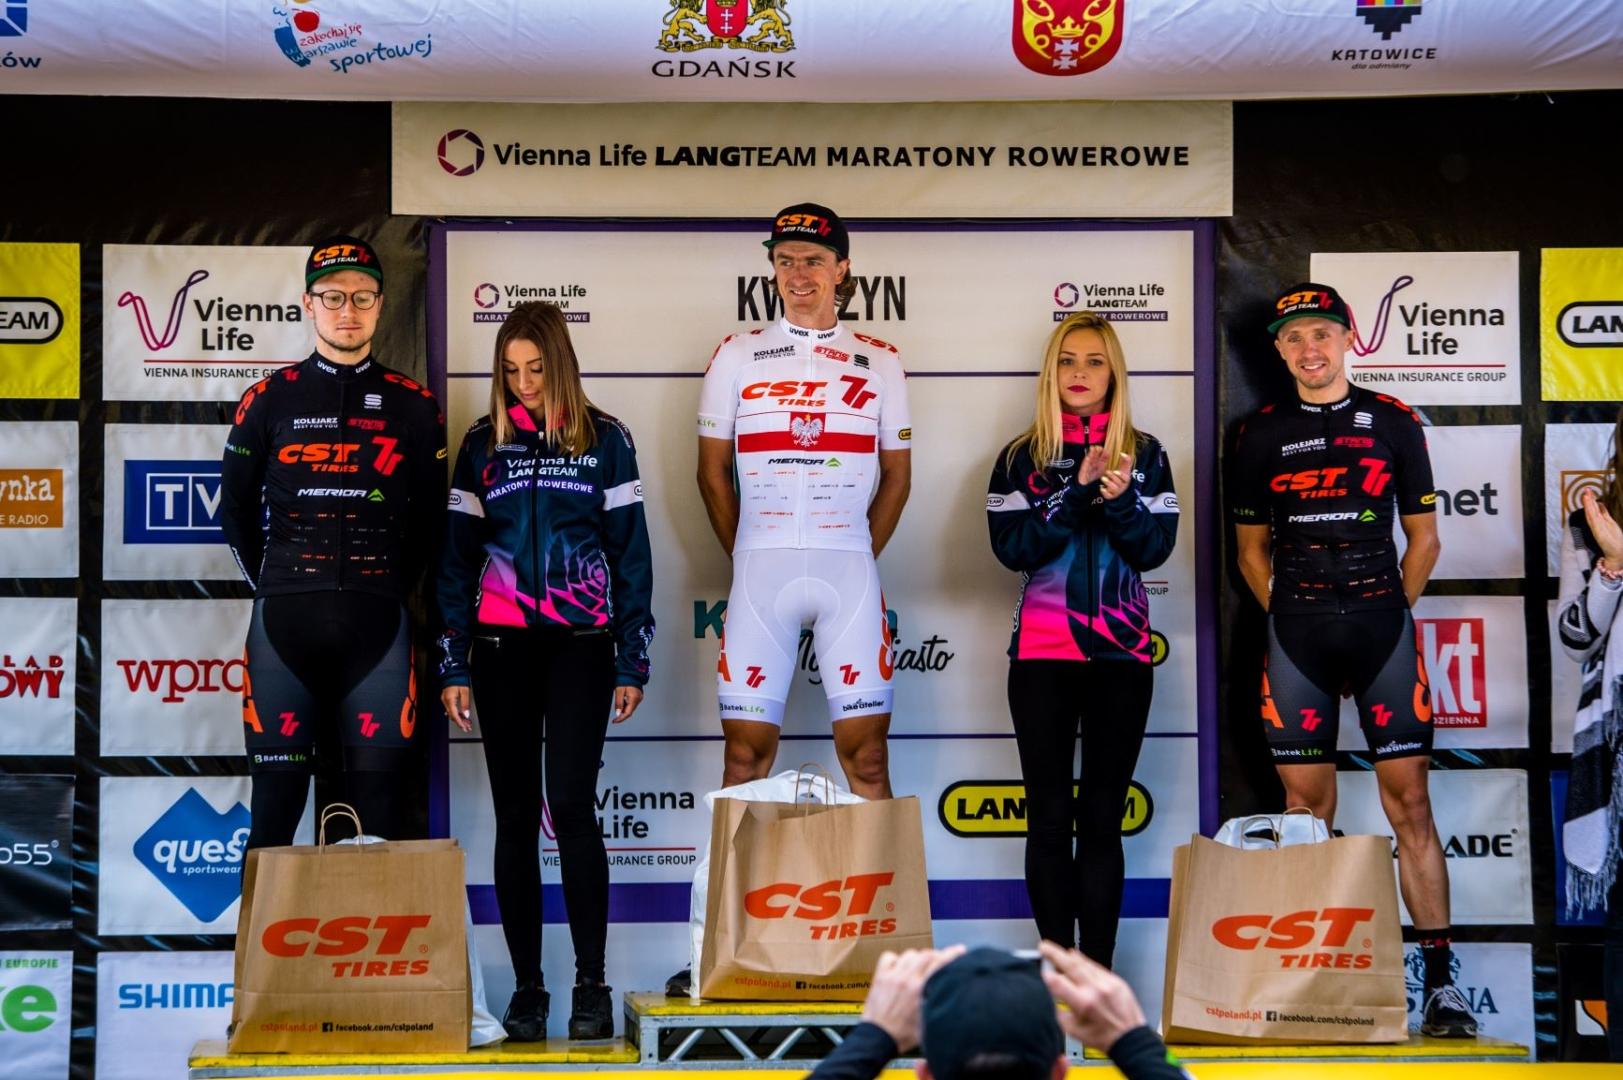 CST 7R MTB Team dominuje w generalce Vienna Life Lang Team Maratony Rowerowe